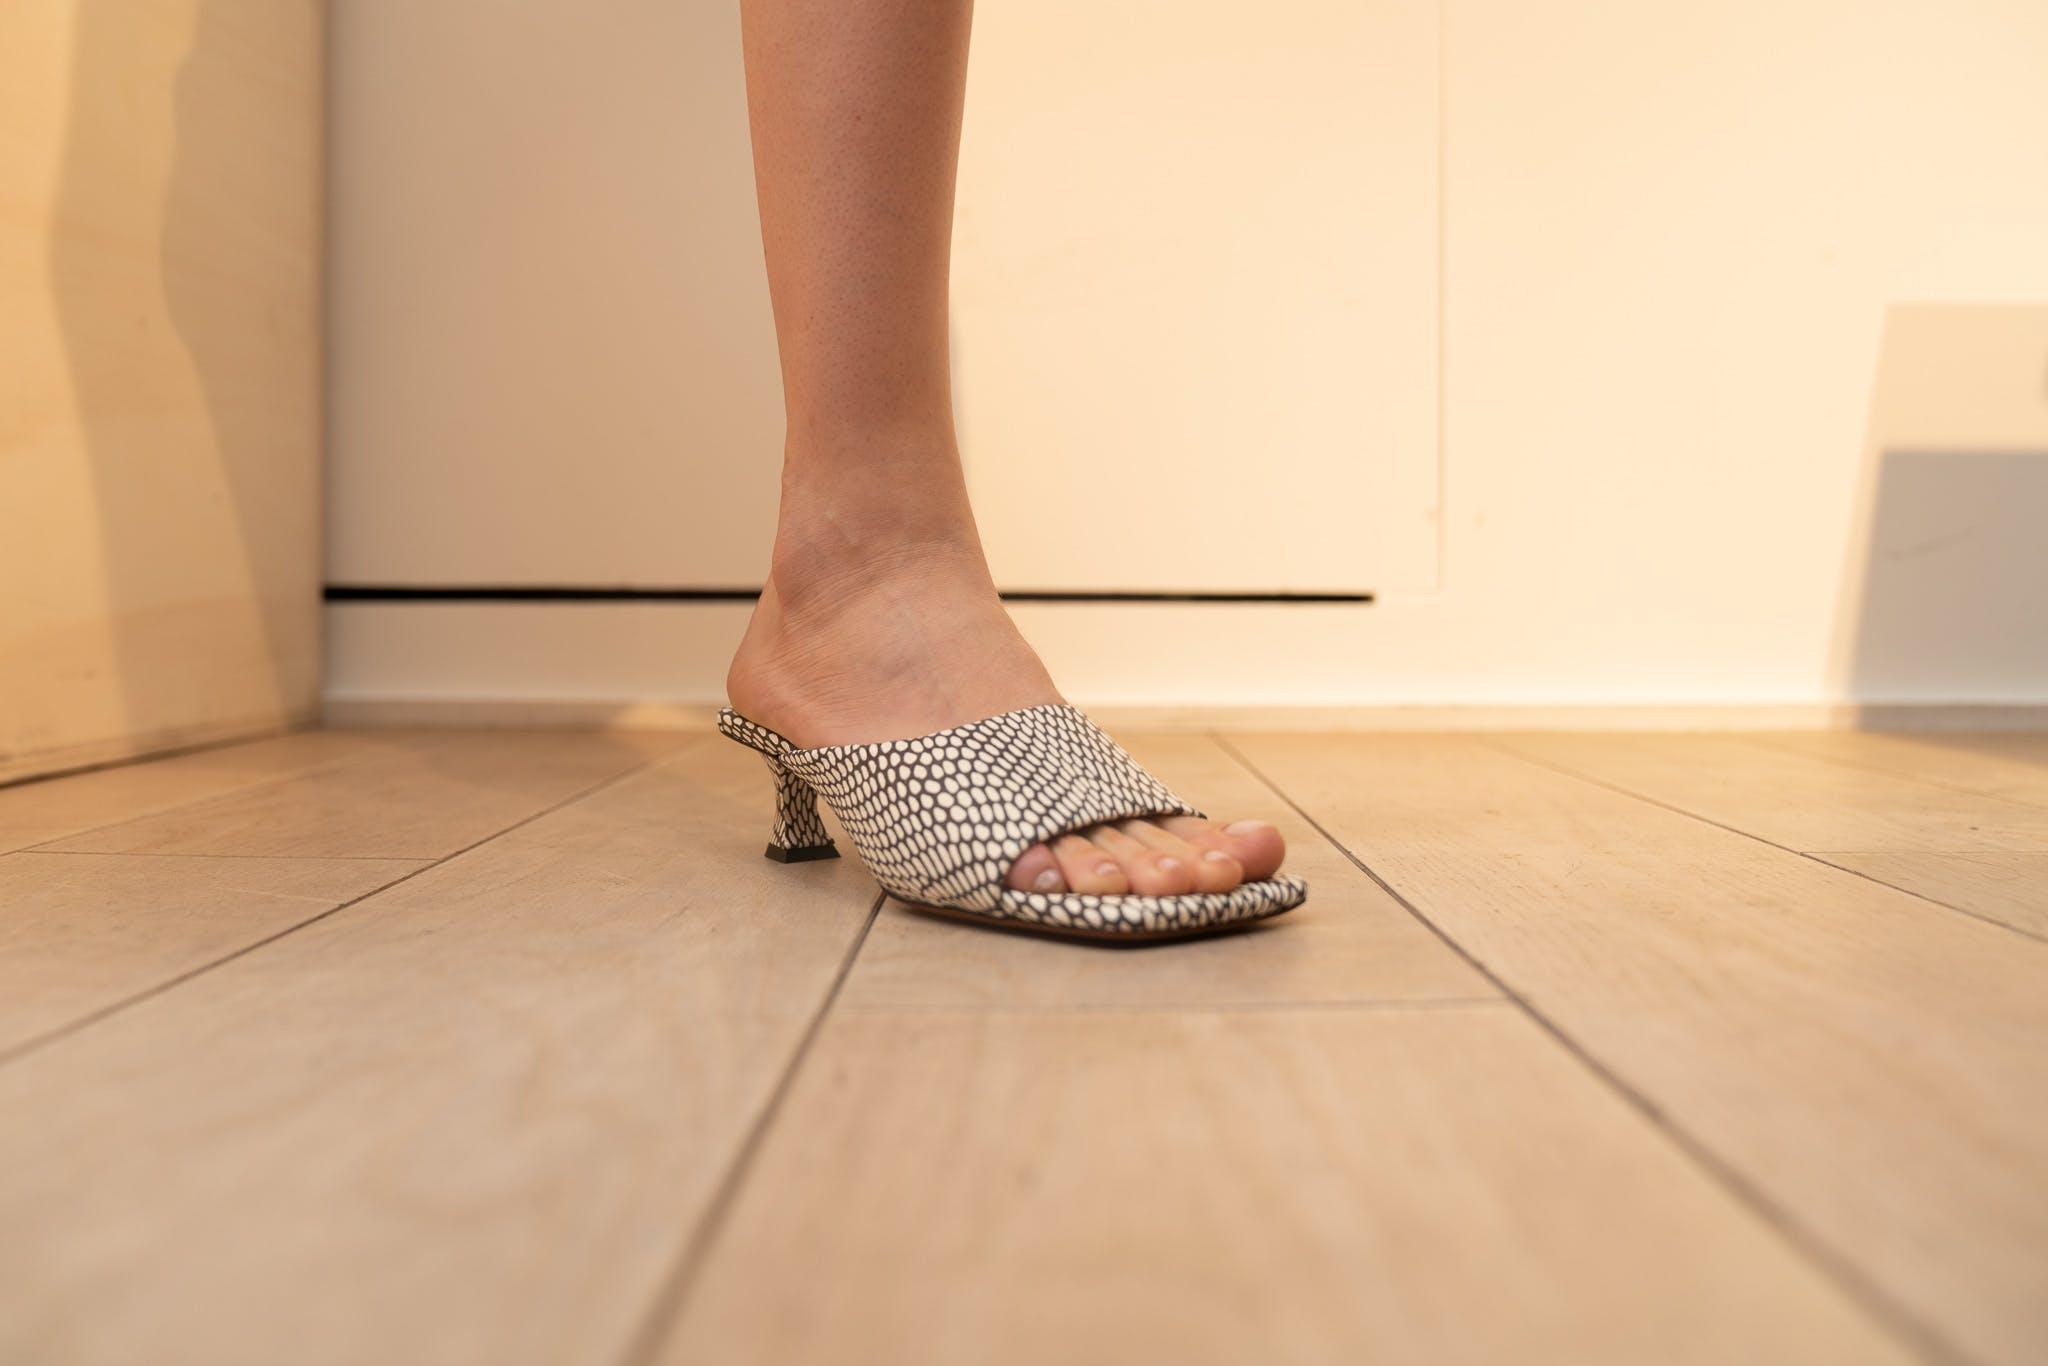 Proenza Schouler ShowroomMid Heel Sandal in Snake Skin Print SS20 RTW